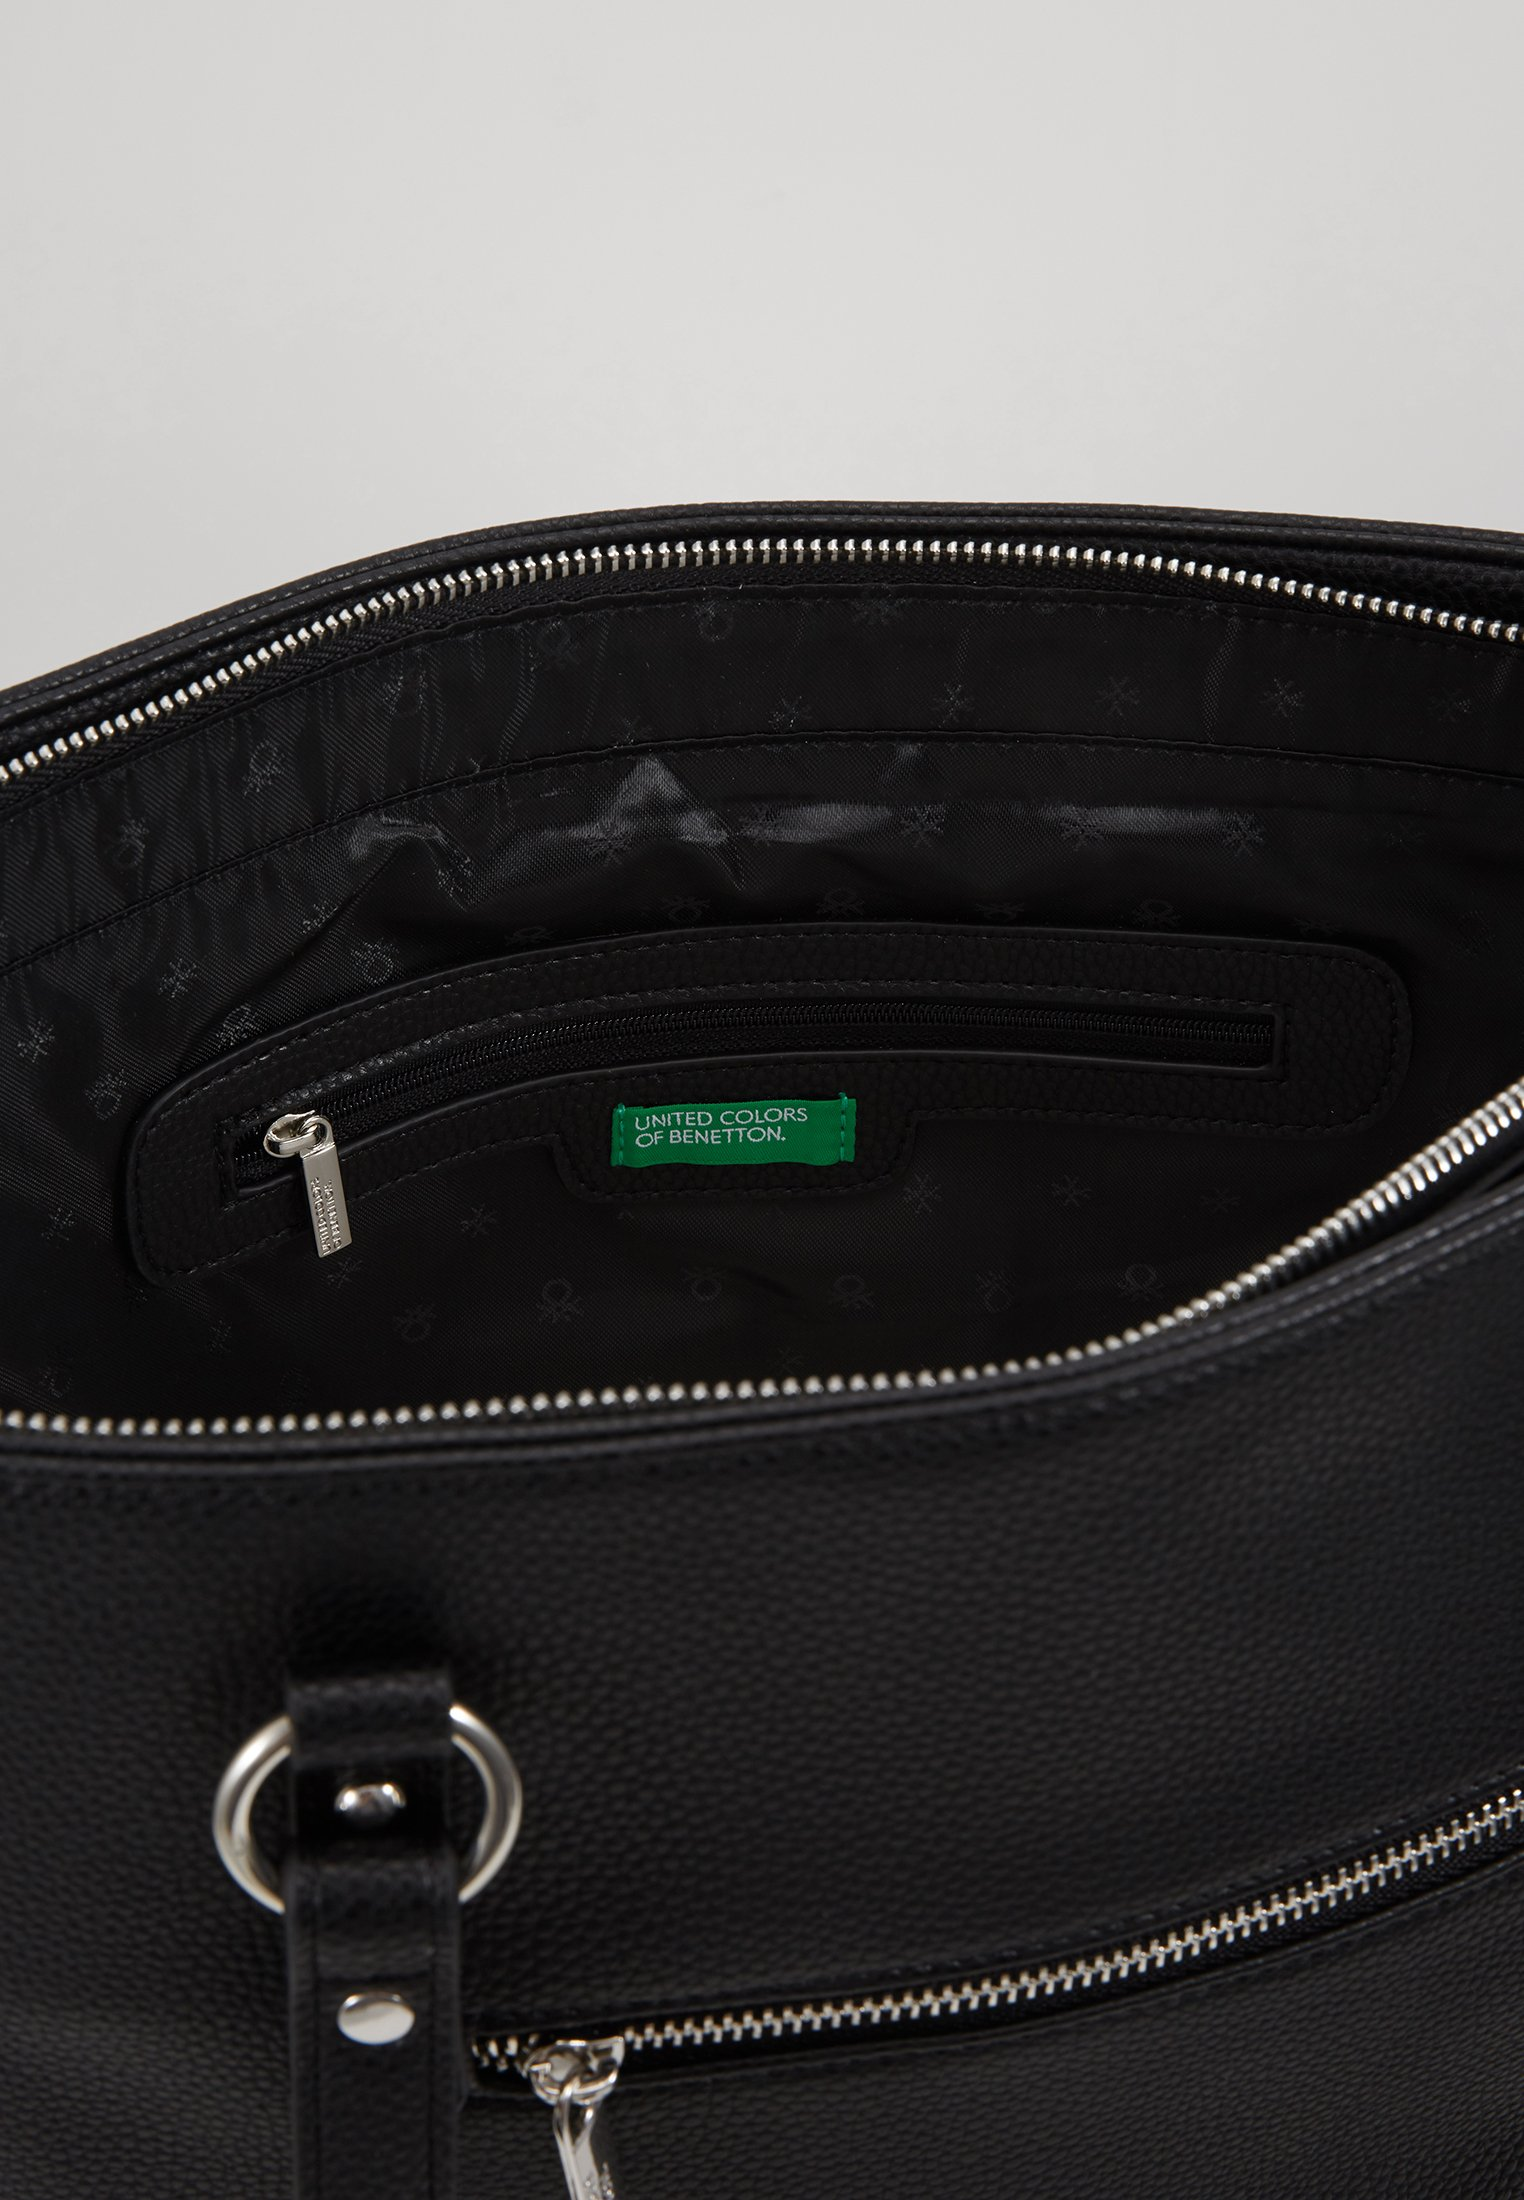 Benetton Borsa A Mano - Black kjonvti